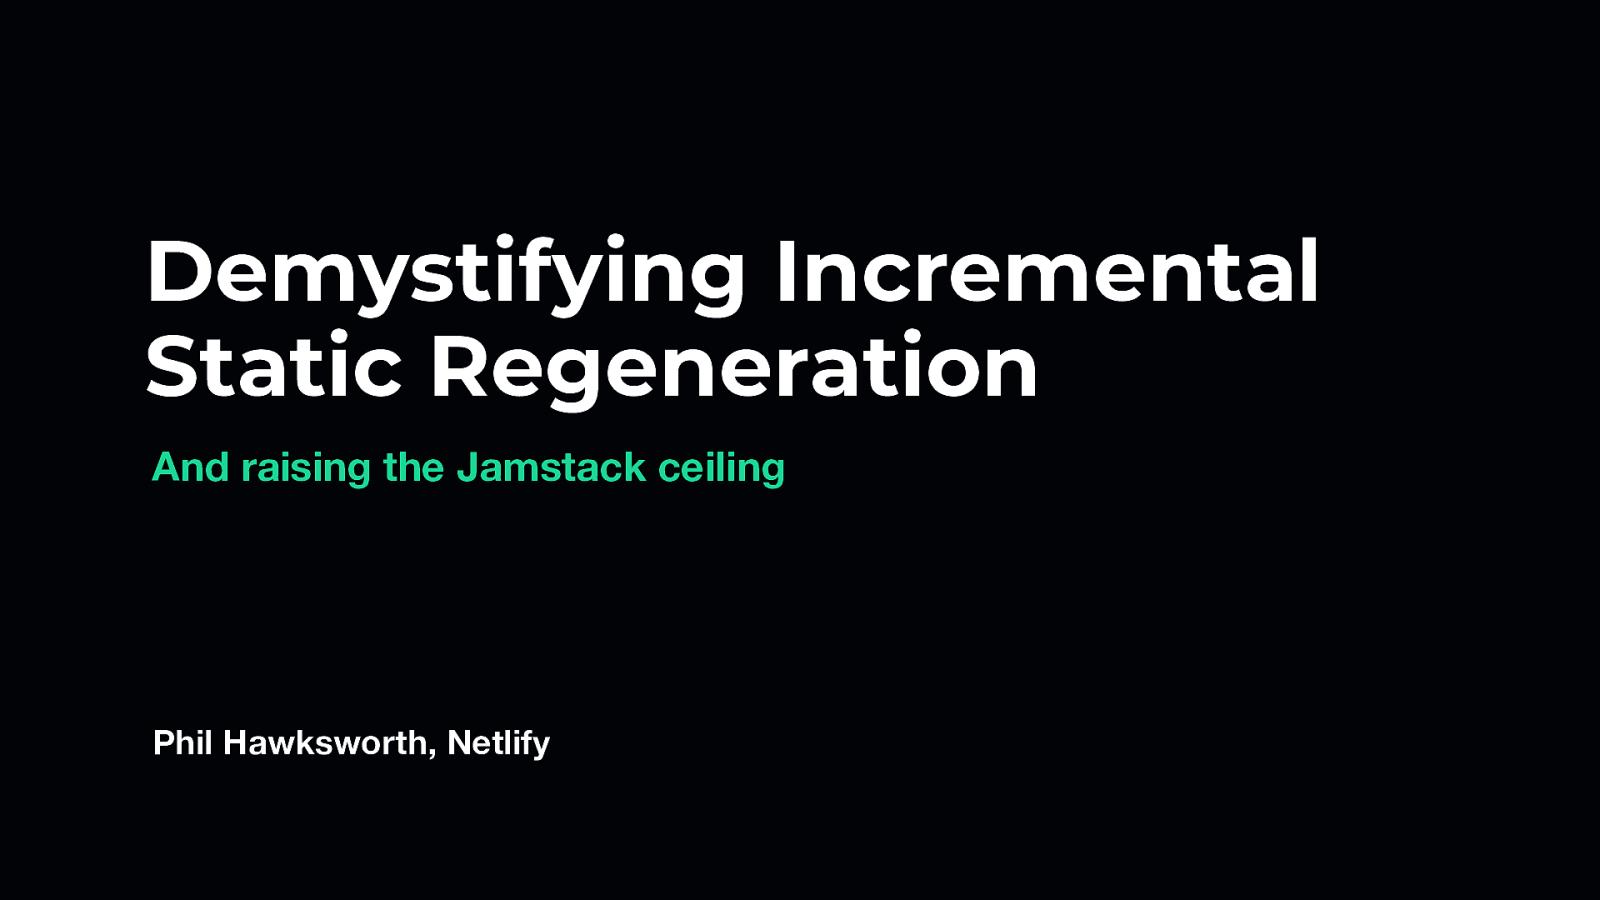 Demystifying incremental static regeneration